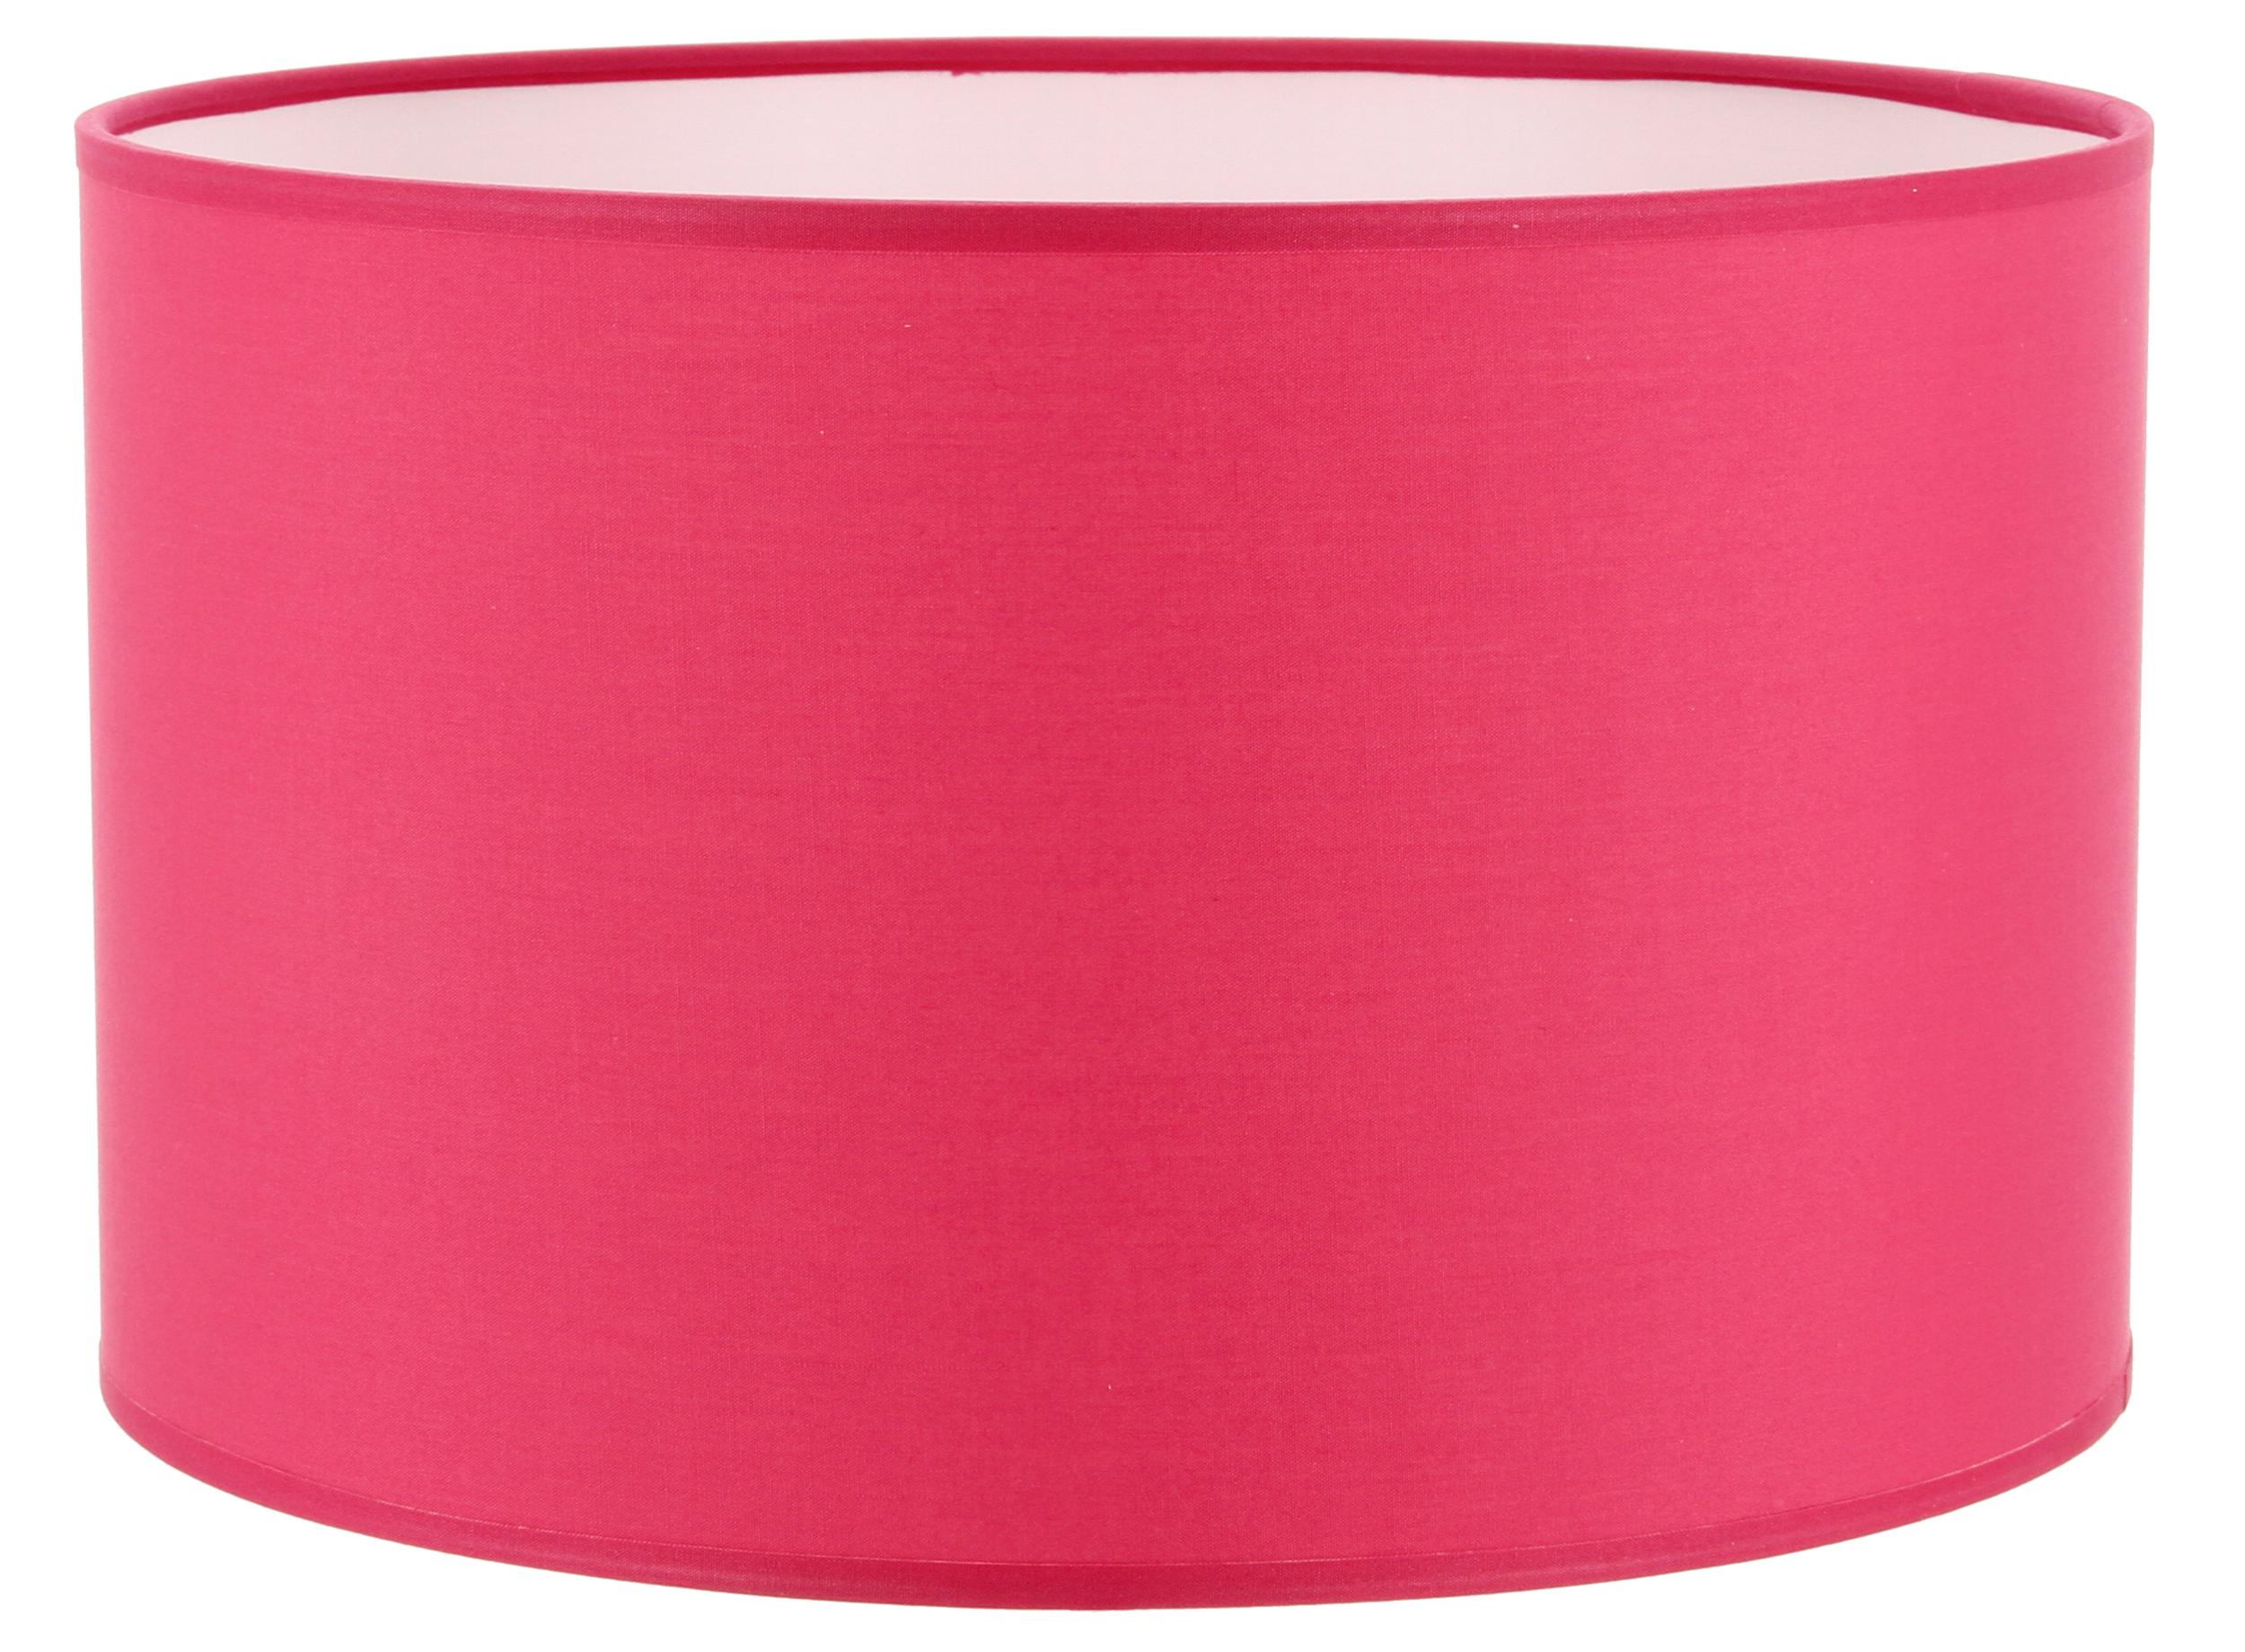 abat jour cylindre rose framboise abat jour abat jour. Black Bedroom Furniture Sets. Home Design Ideas